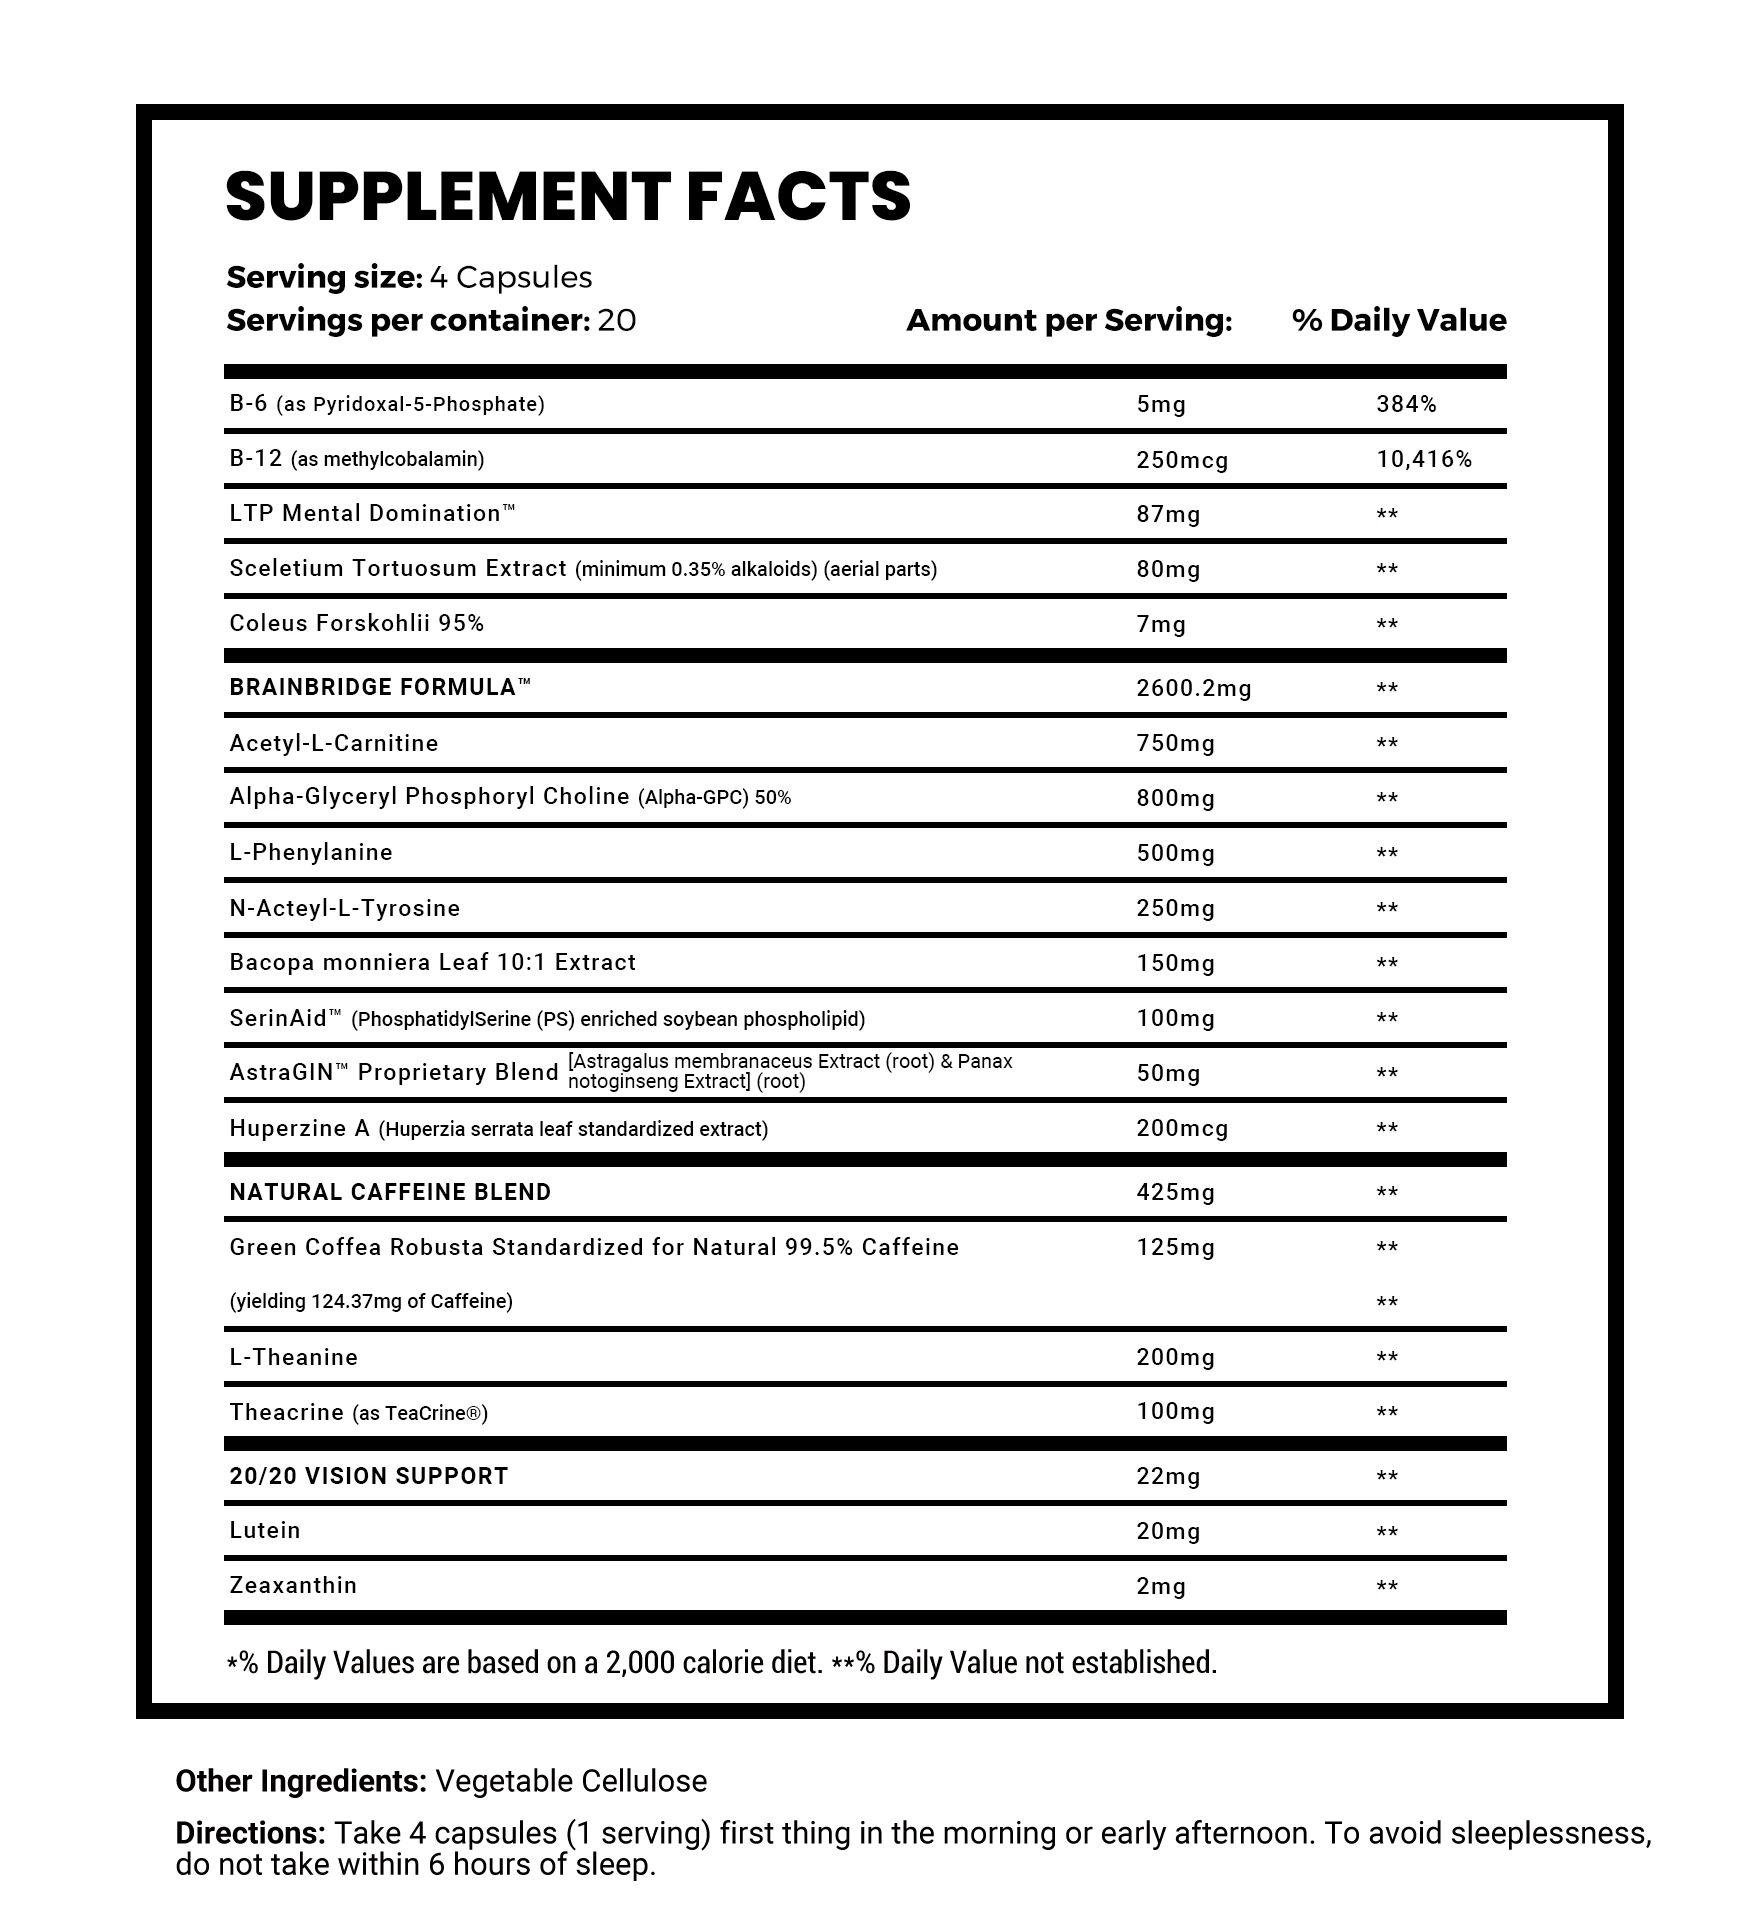 sup-facts-brain-caps.jpg